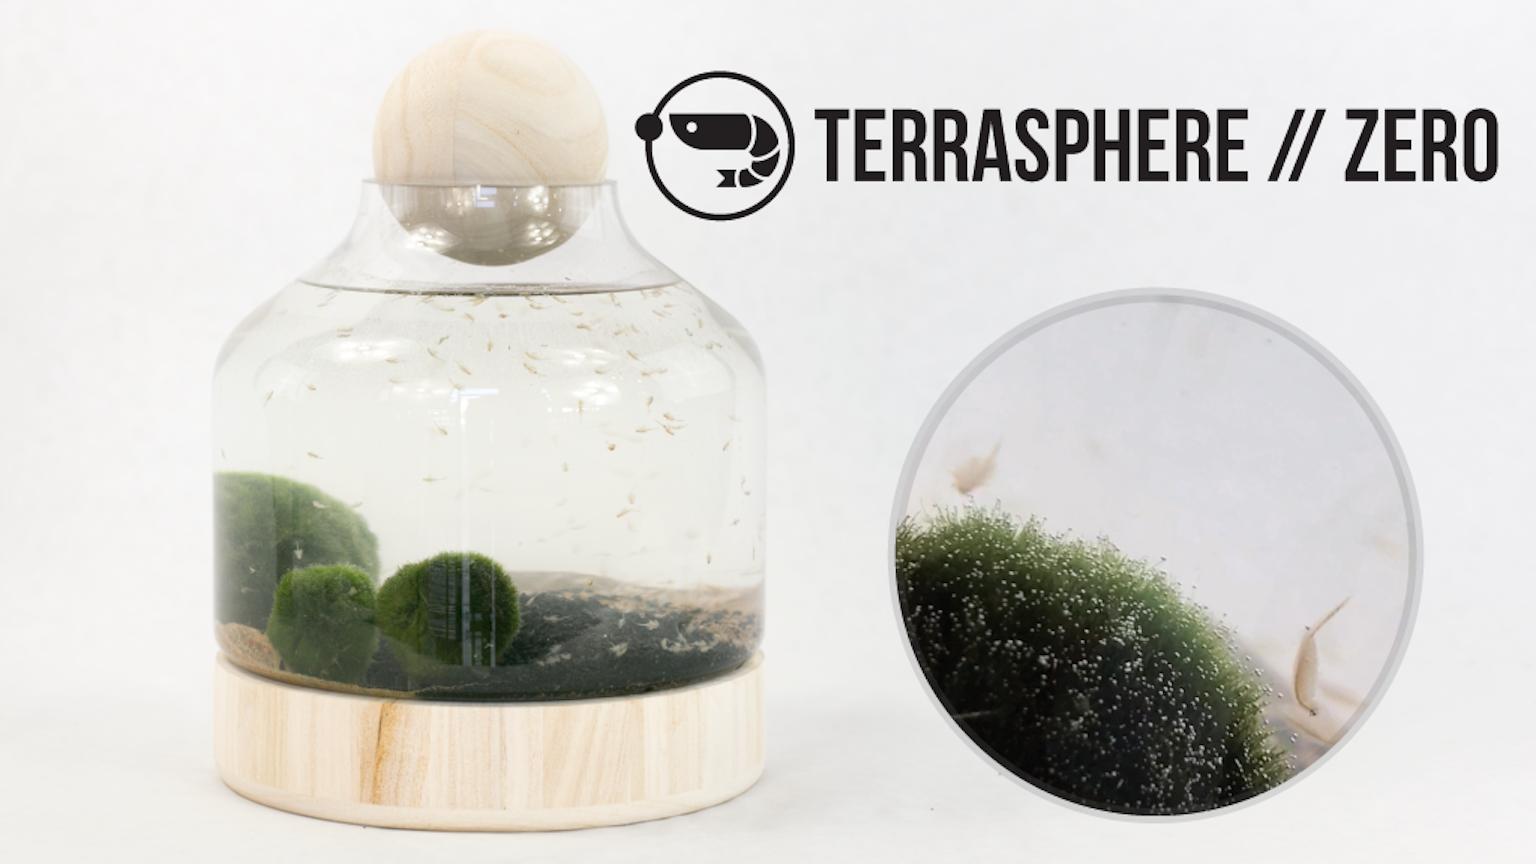 Terrasphere Zero Self Sustaining Terrariums By Mike Stone